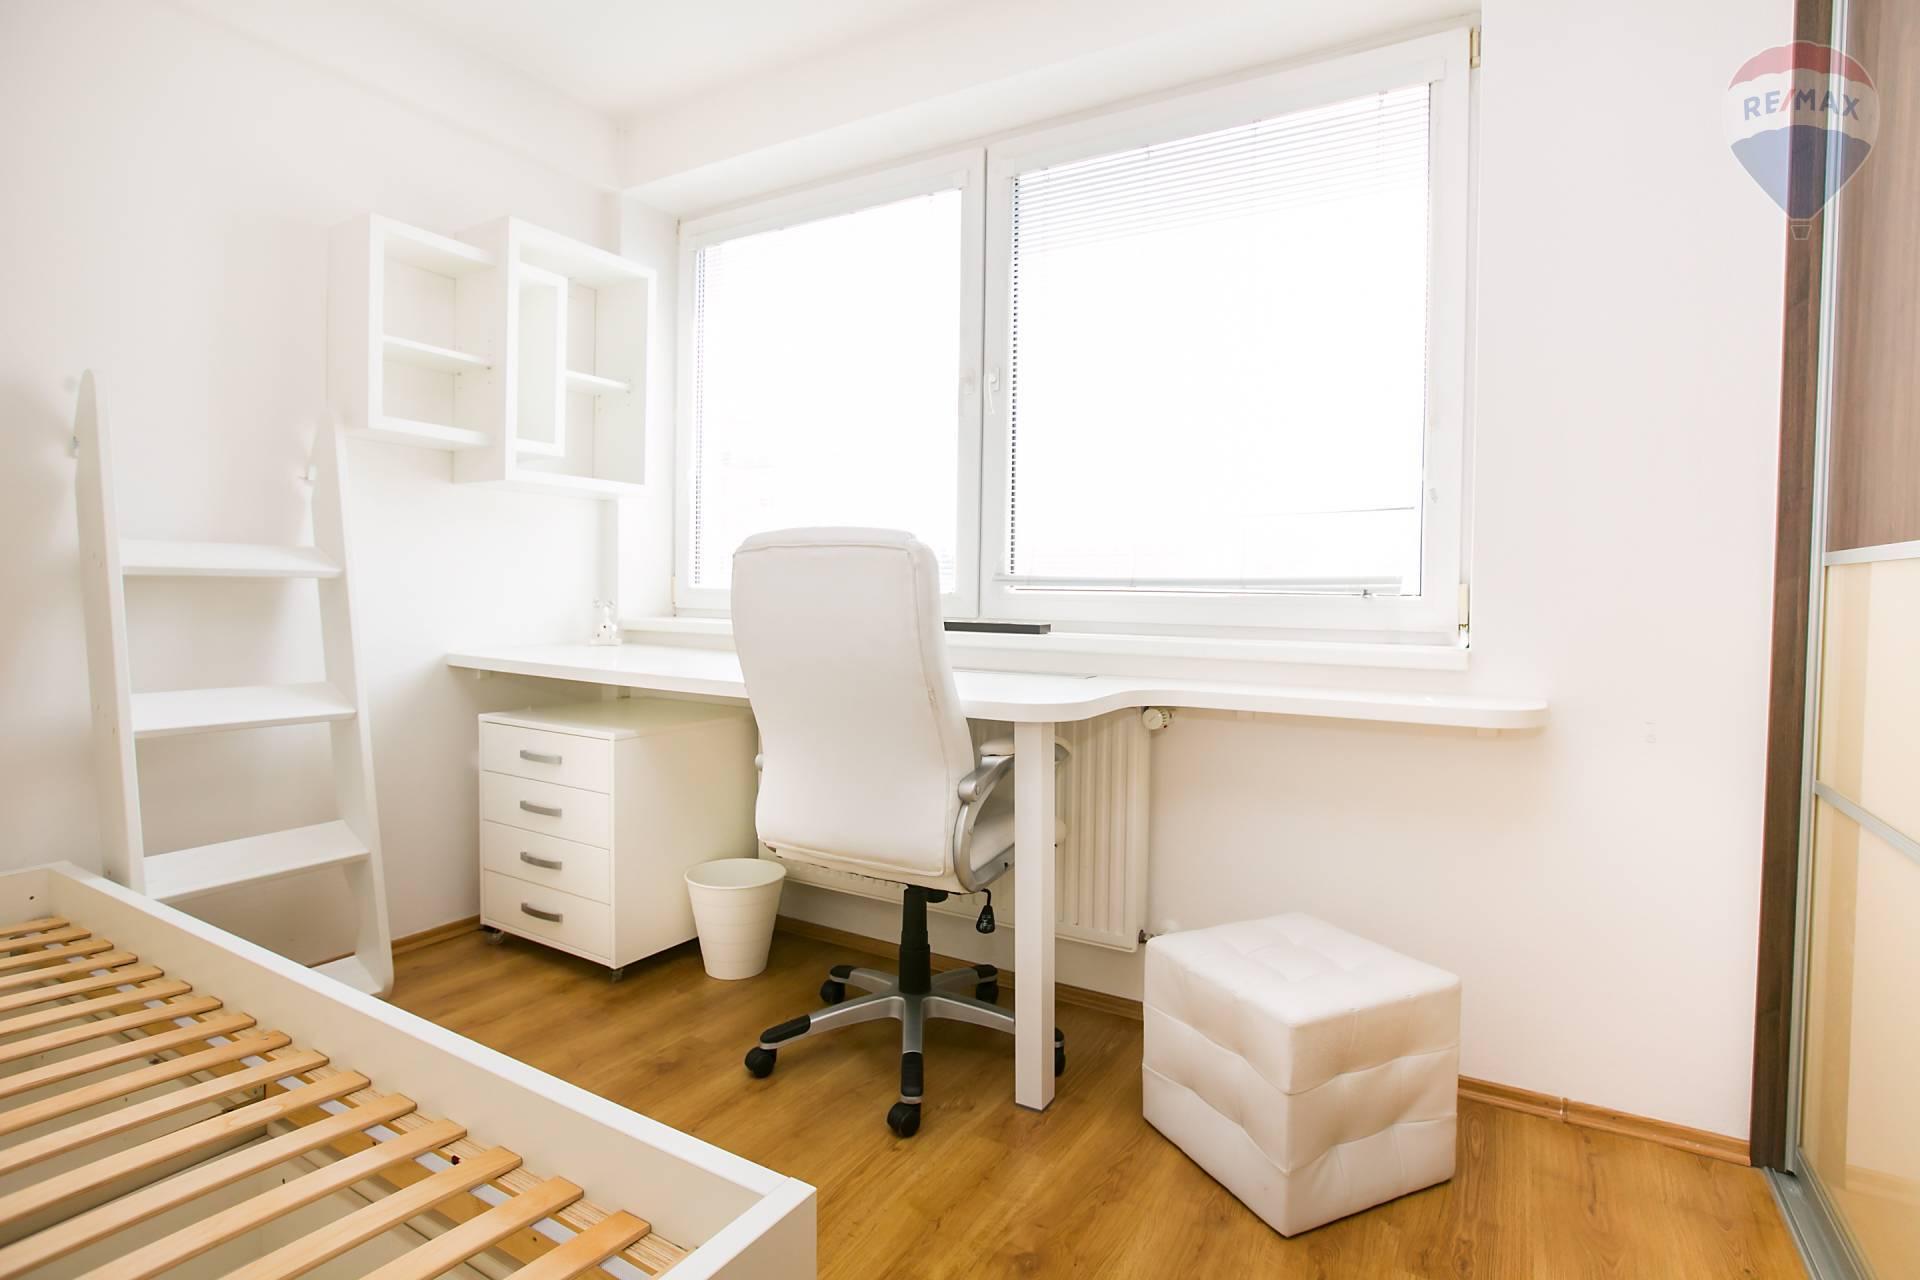 Prenájom bytu (2 izbový) 48 m2, Bratislava - Podunajské Biskupice - detská izba